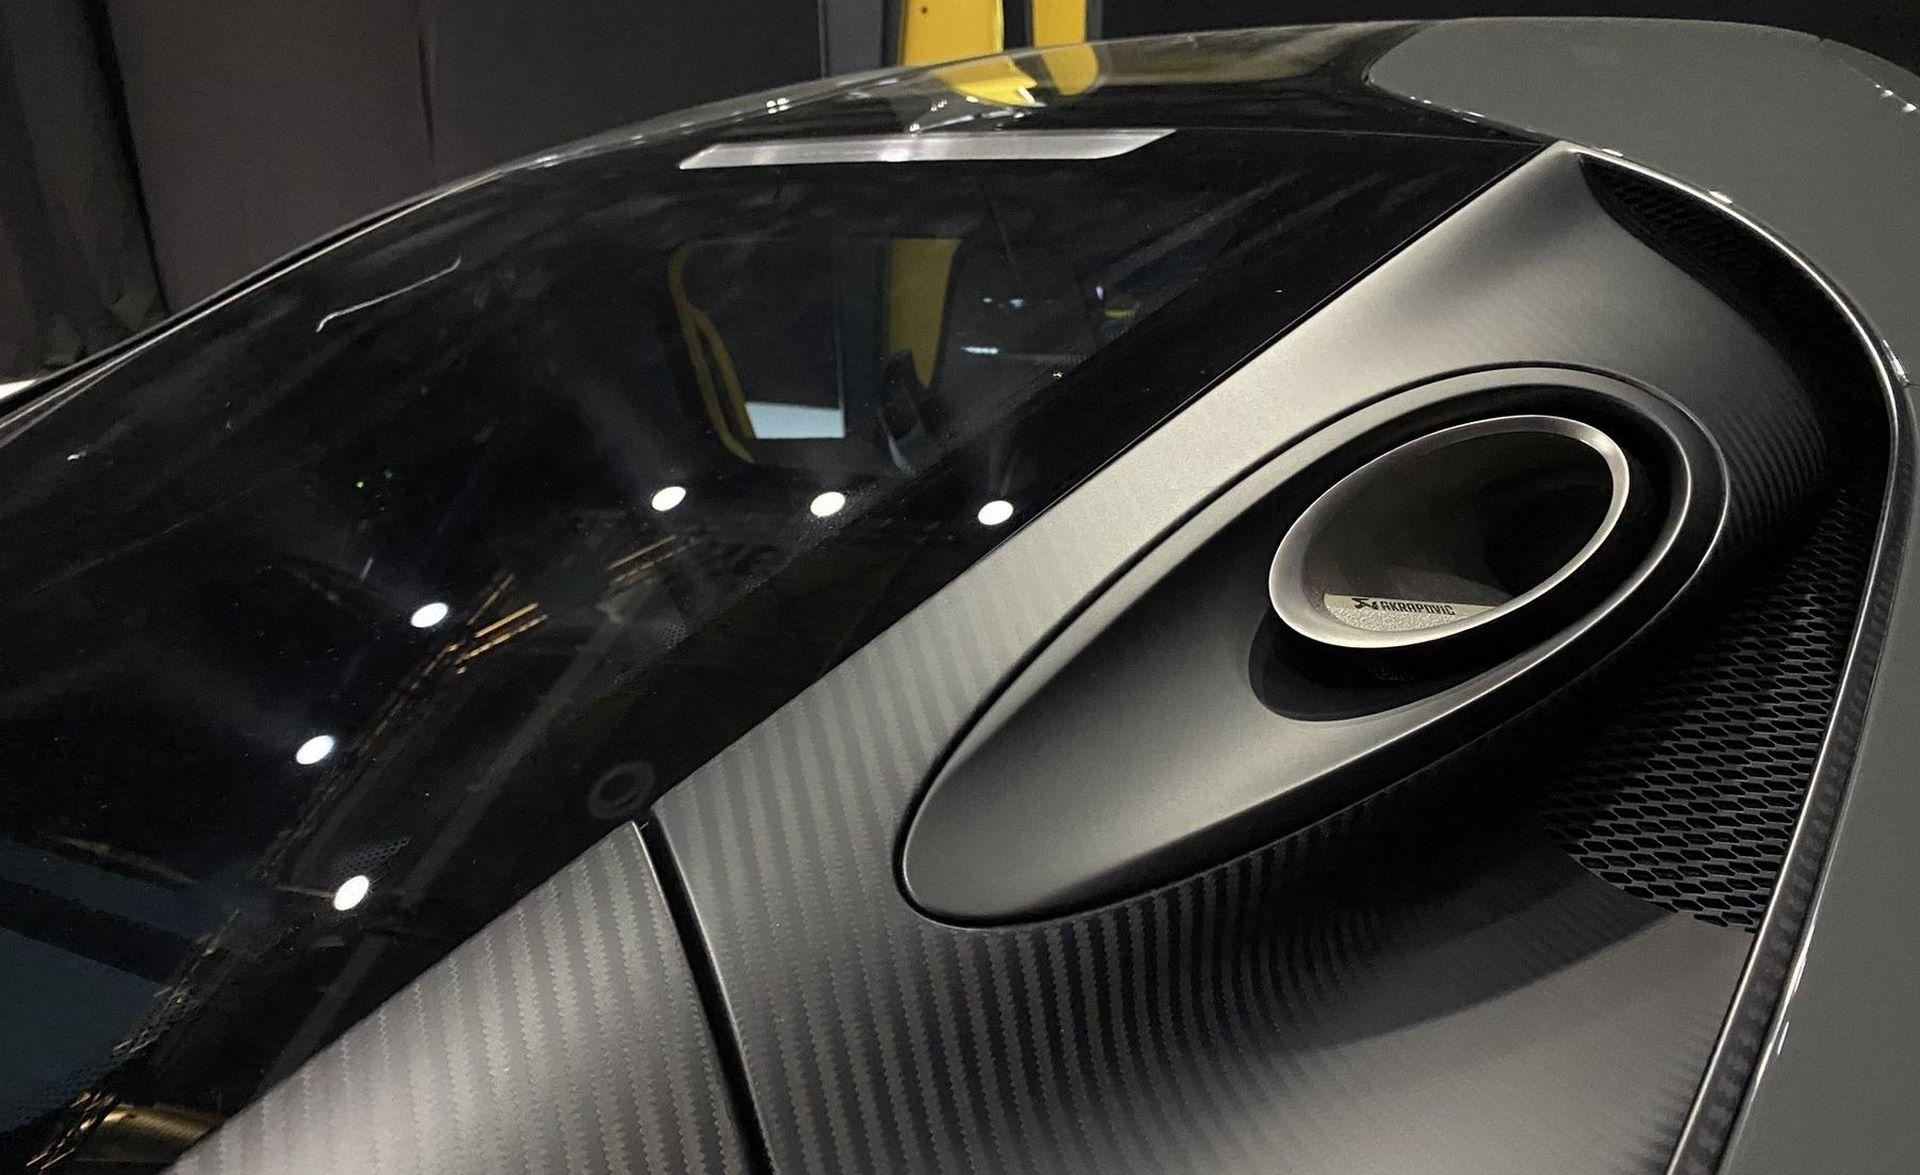 Geneva motor show 2020 (18)